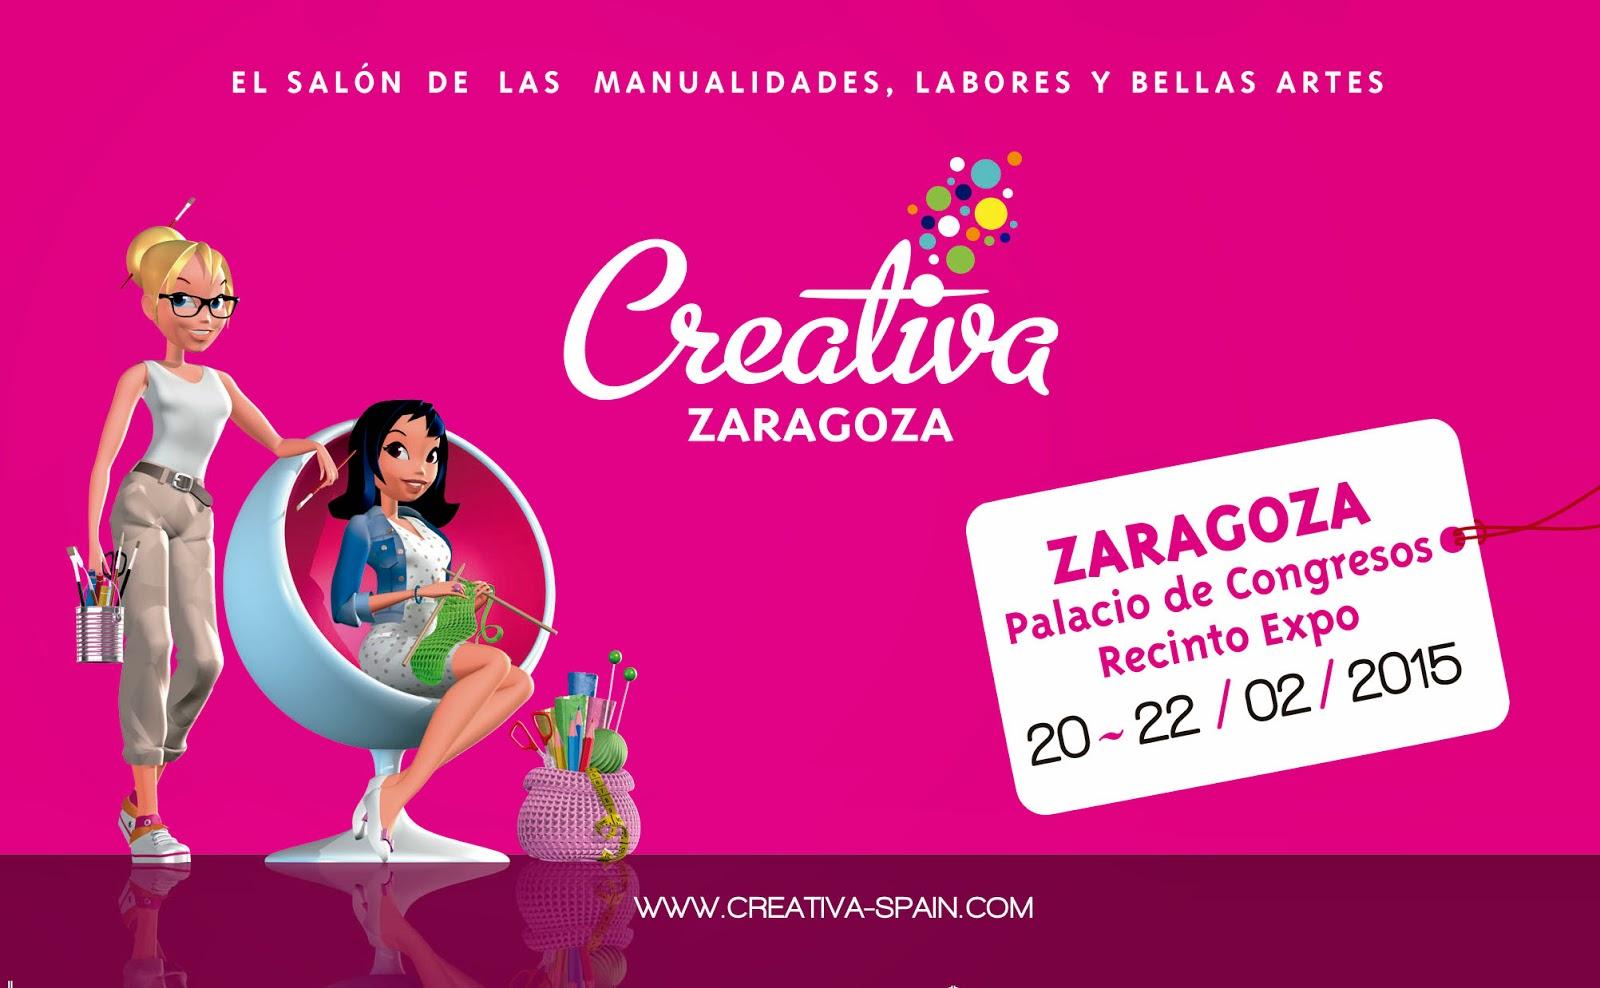 http://www.creativa-spain.com/creativa/zaragoza/informacion.aspx